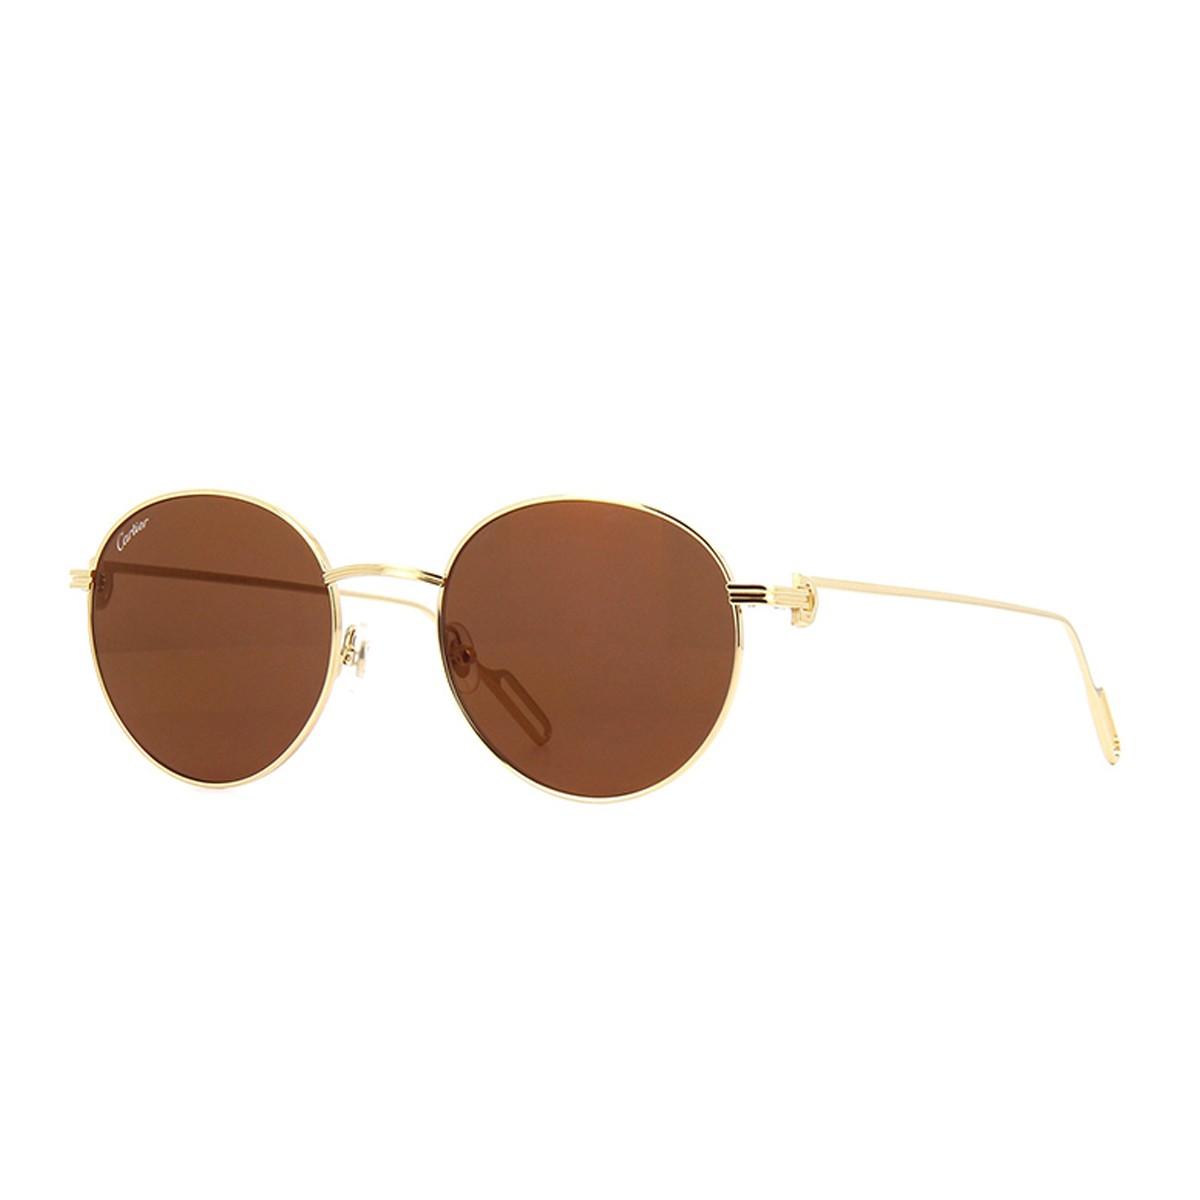 Cartier CT0249S | Unisex sunglasses